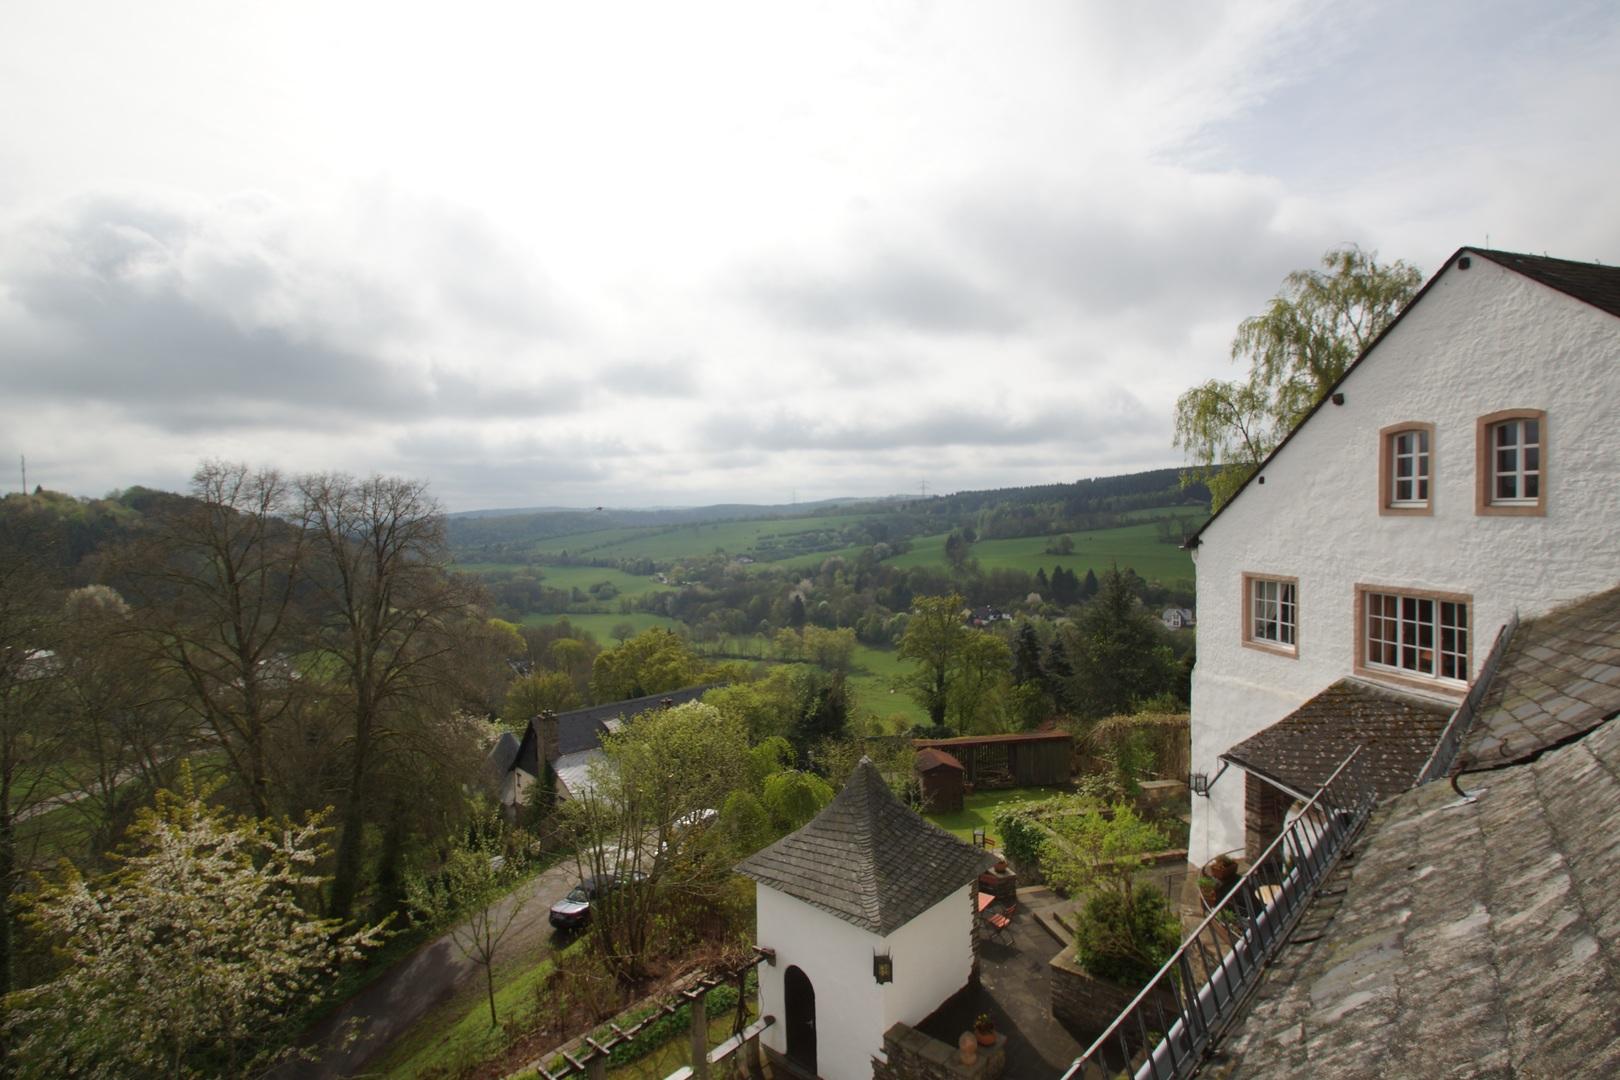 Building A House On Sloped Land Biggest Challenges